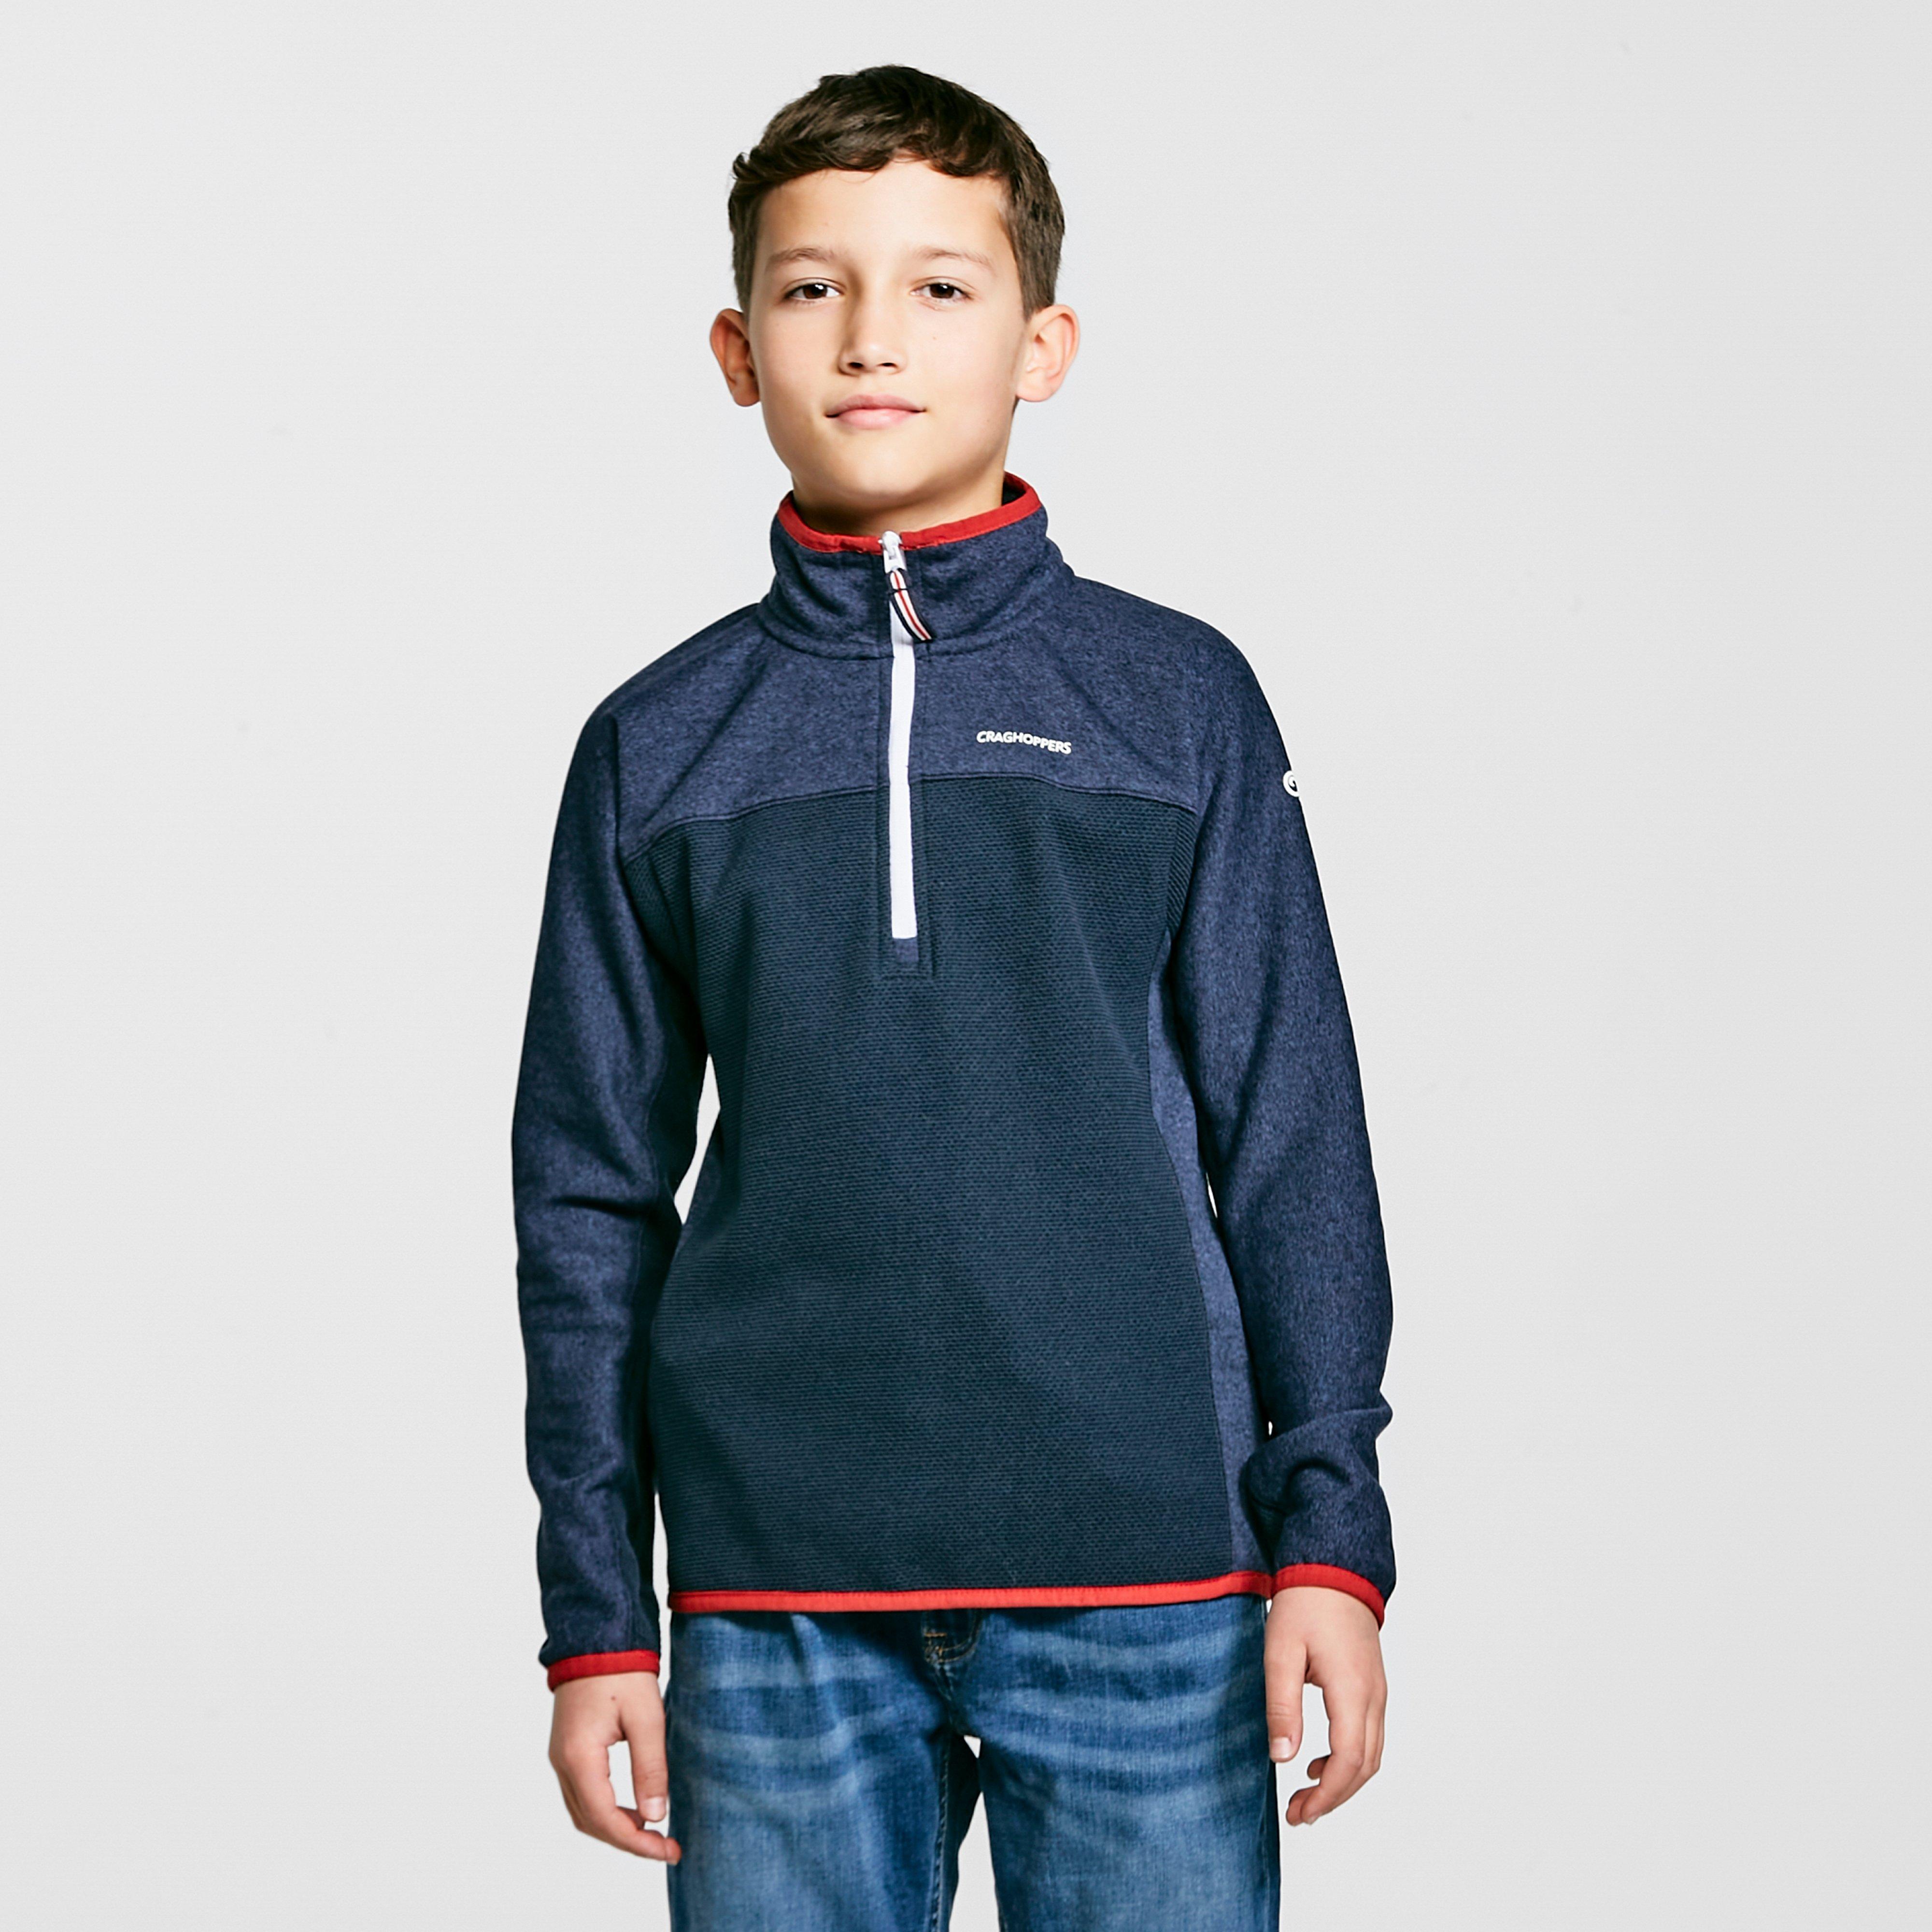 Craghoppers Boys Abilio Insualted Half Zip Fleece Jacket